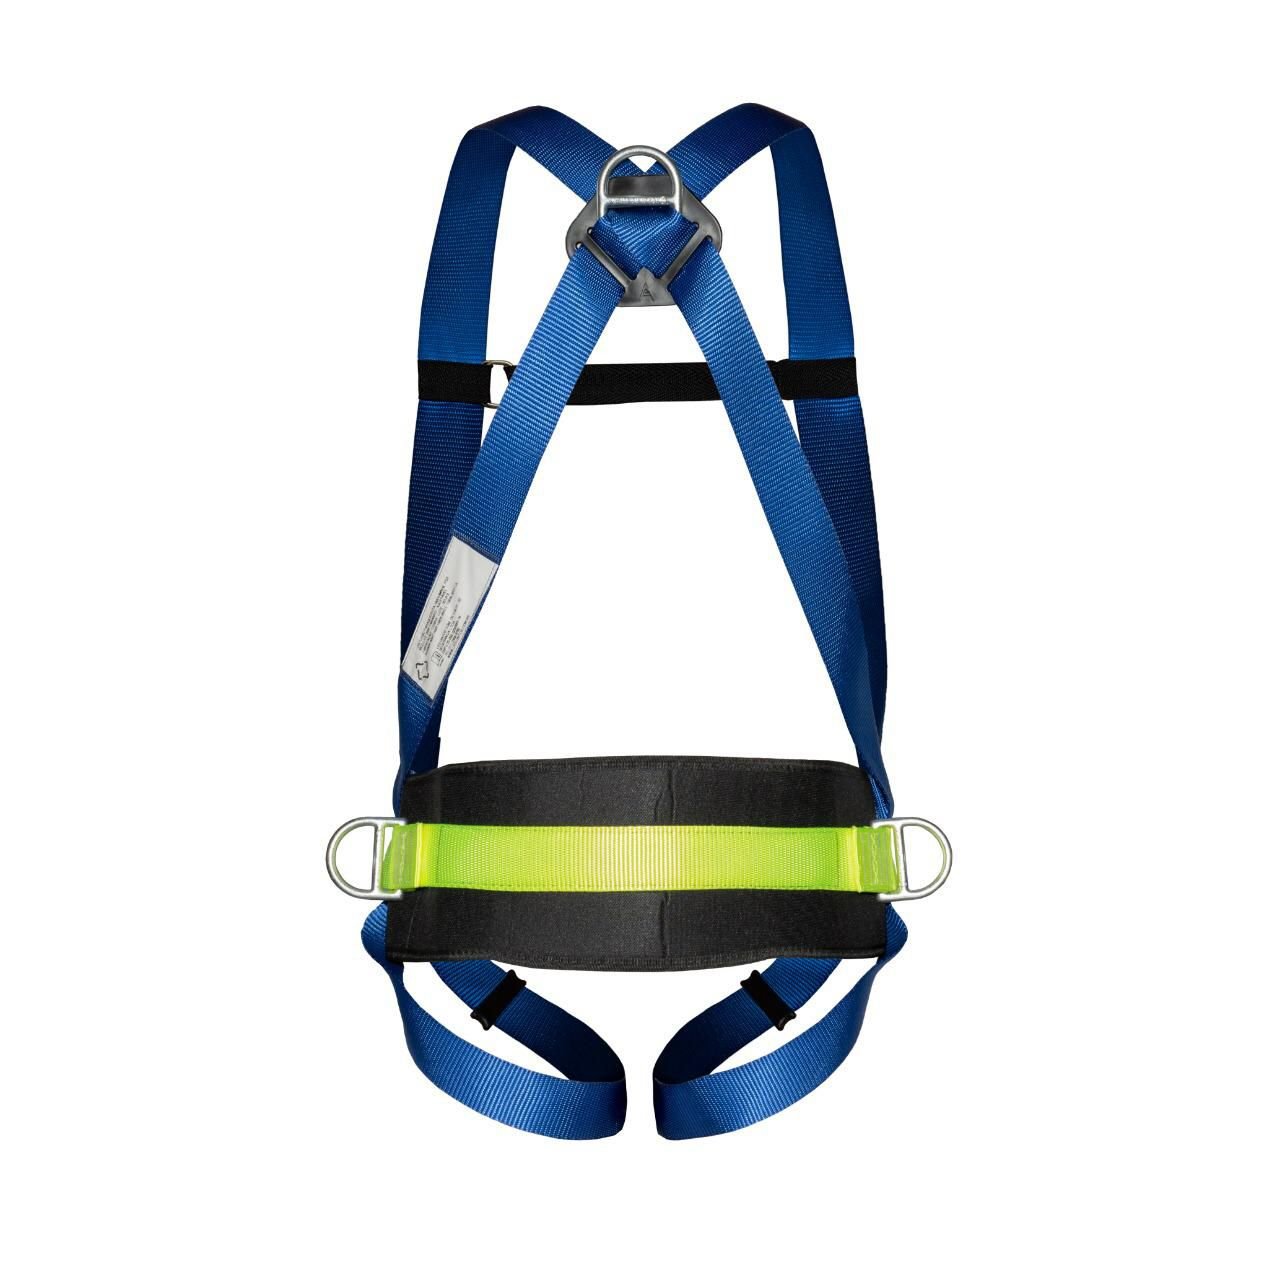 Cinturão Paraquedista Life 2004 3 Pontos Com Talabarte Y Elastizado ABS 6002